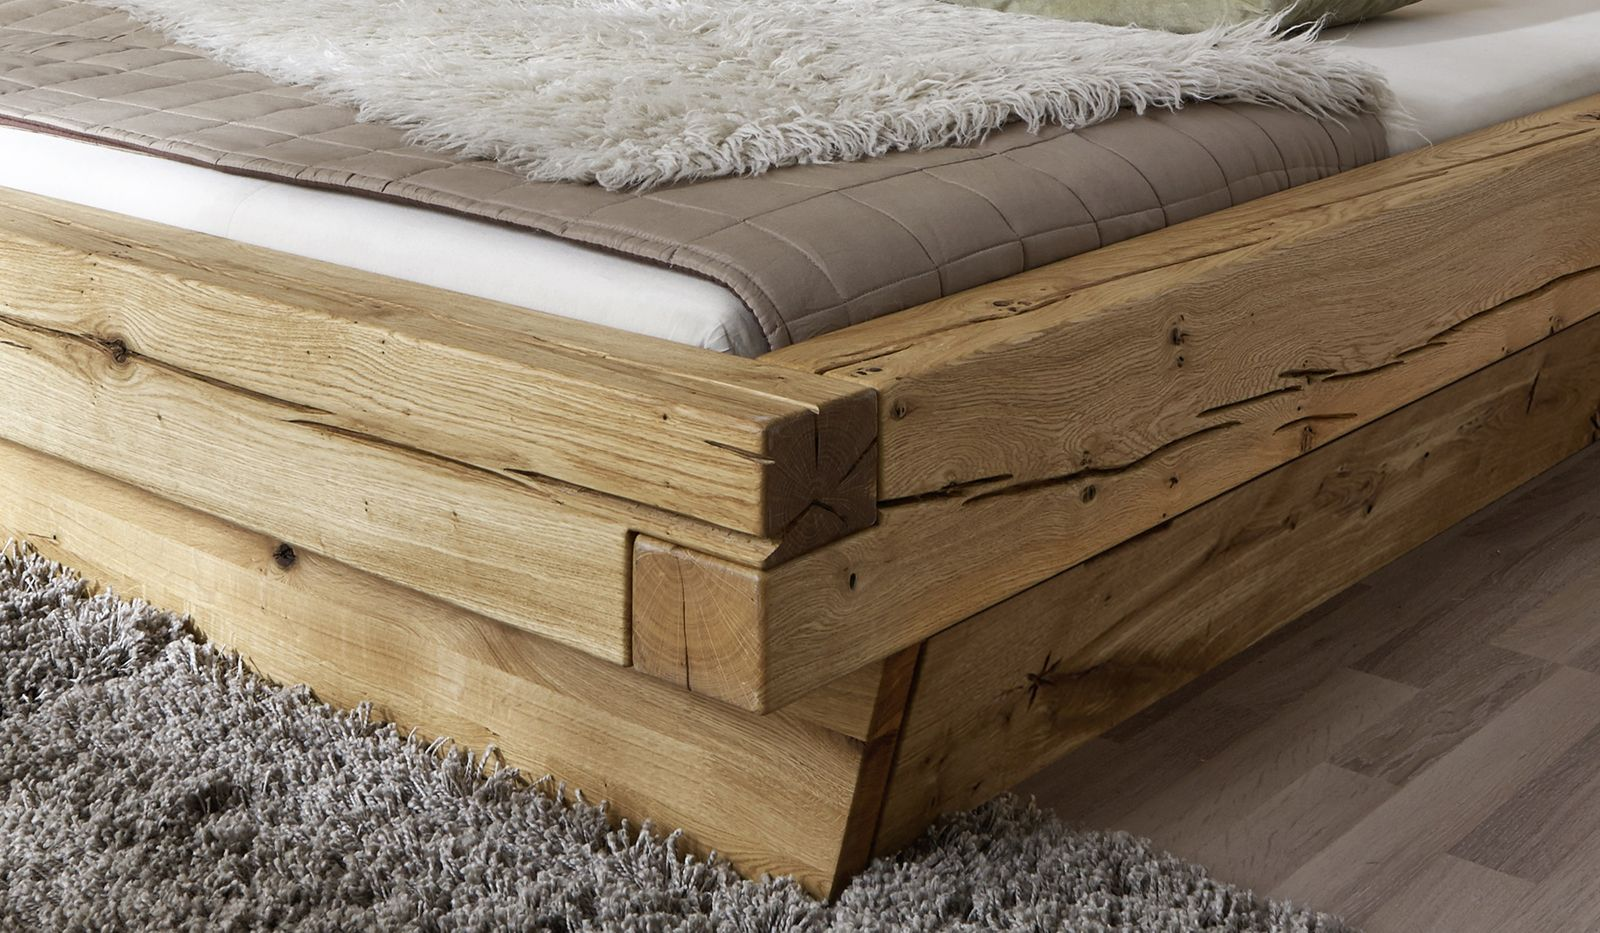 Bettkasten Holz ~ Sam® balkenbett jakob mit schubkästen massiv 200x200 cm demnächst